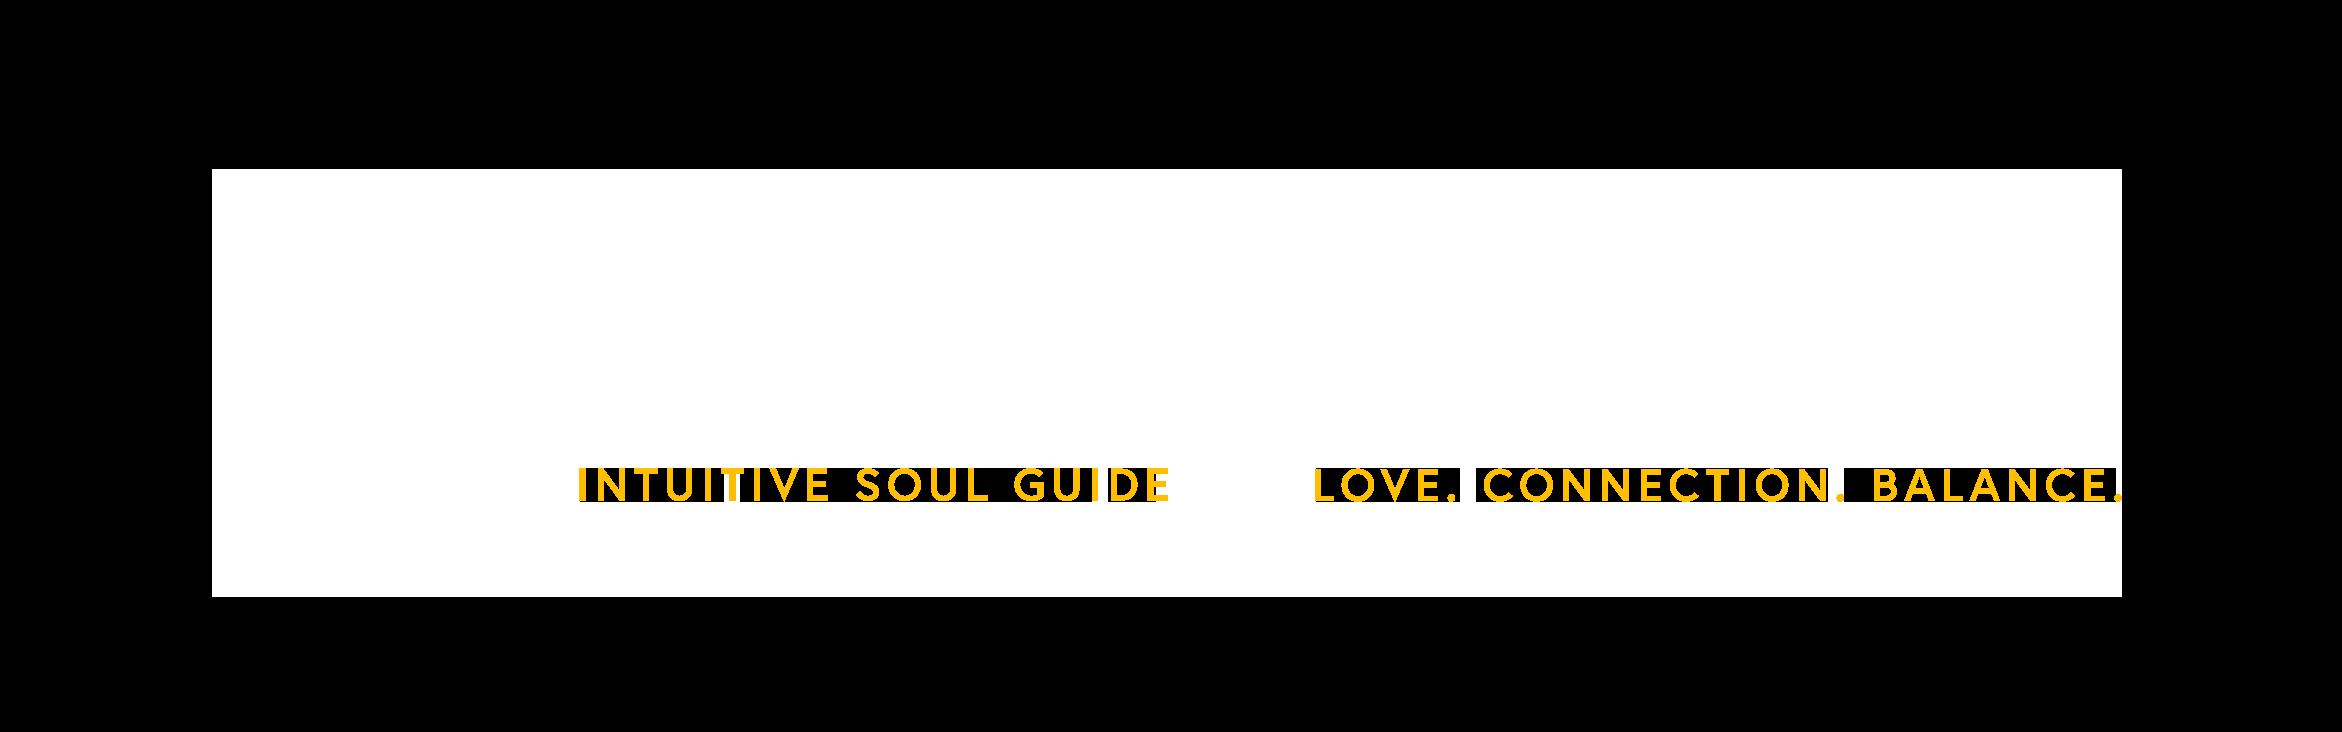 ROSEMARY FAJARDO - HANDWRITTEN-TRANSPARENT.png